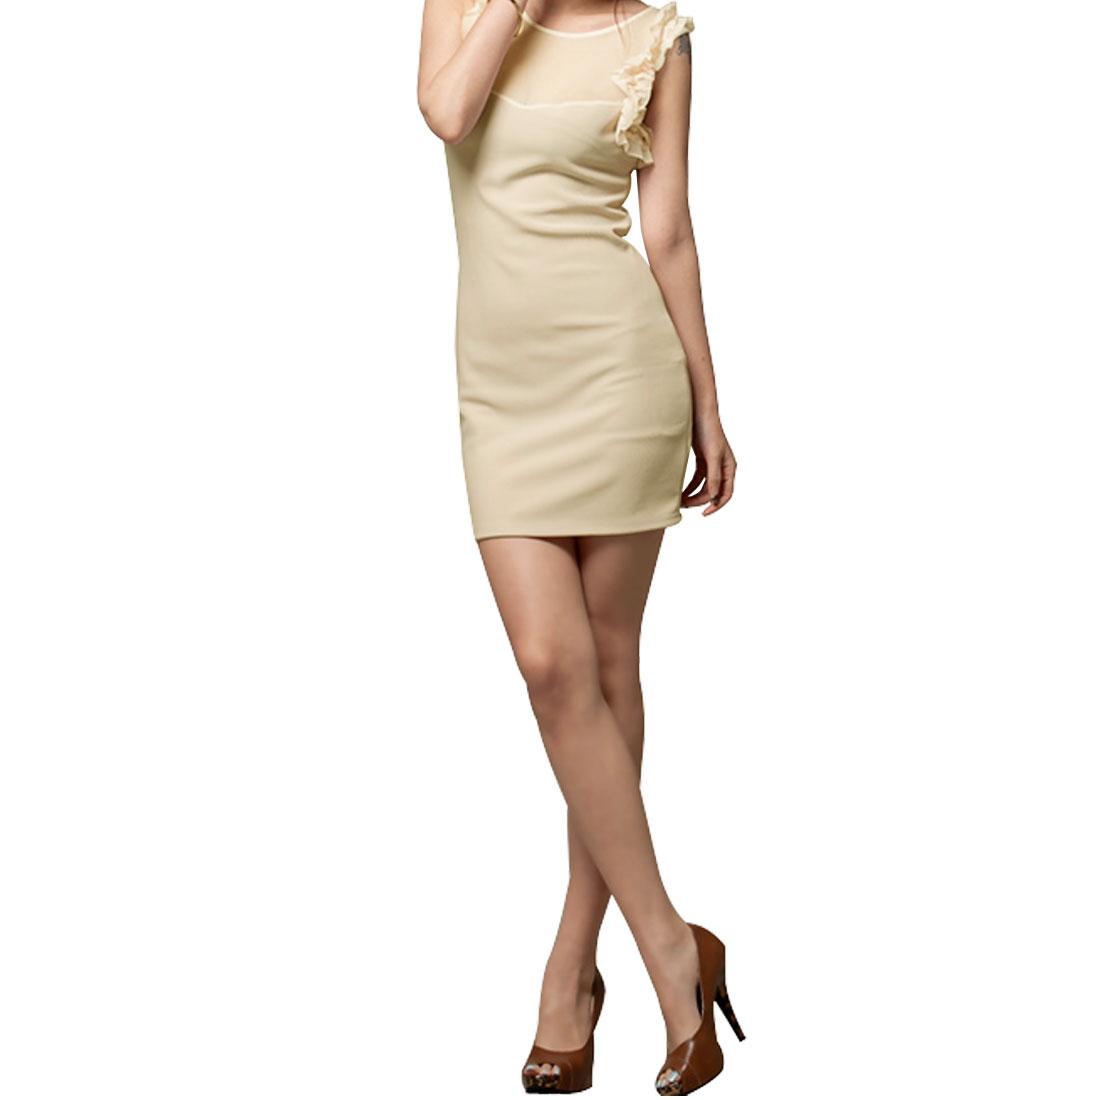 S Beige Mesh Front Design Sleeveless Mini Dress for Ladies